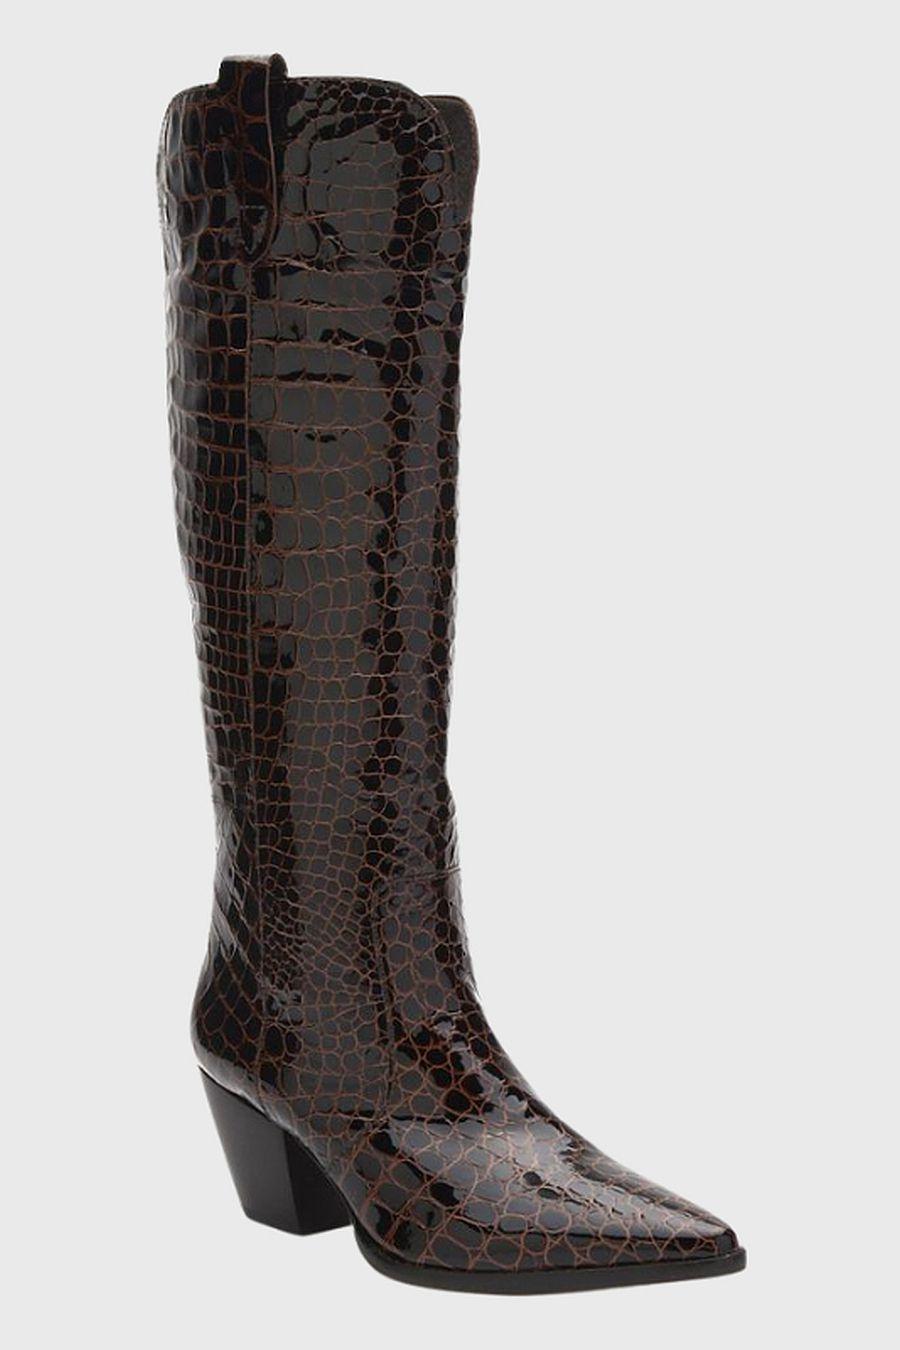 Matisse Footwear Stella Western Boot - chocolate croc